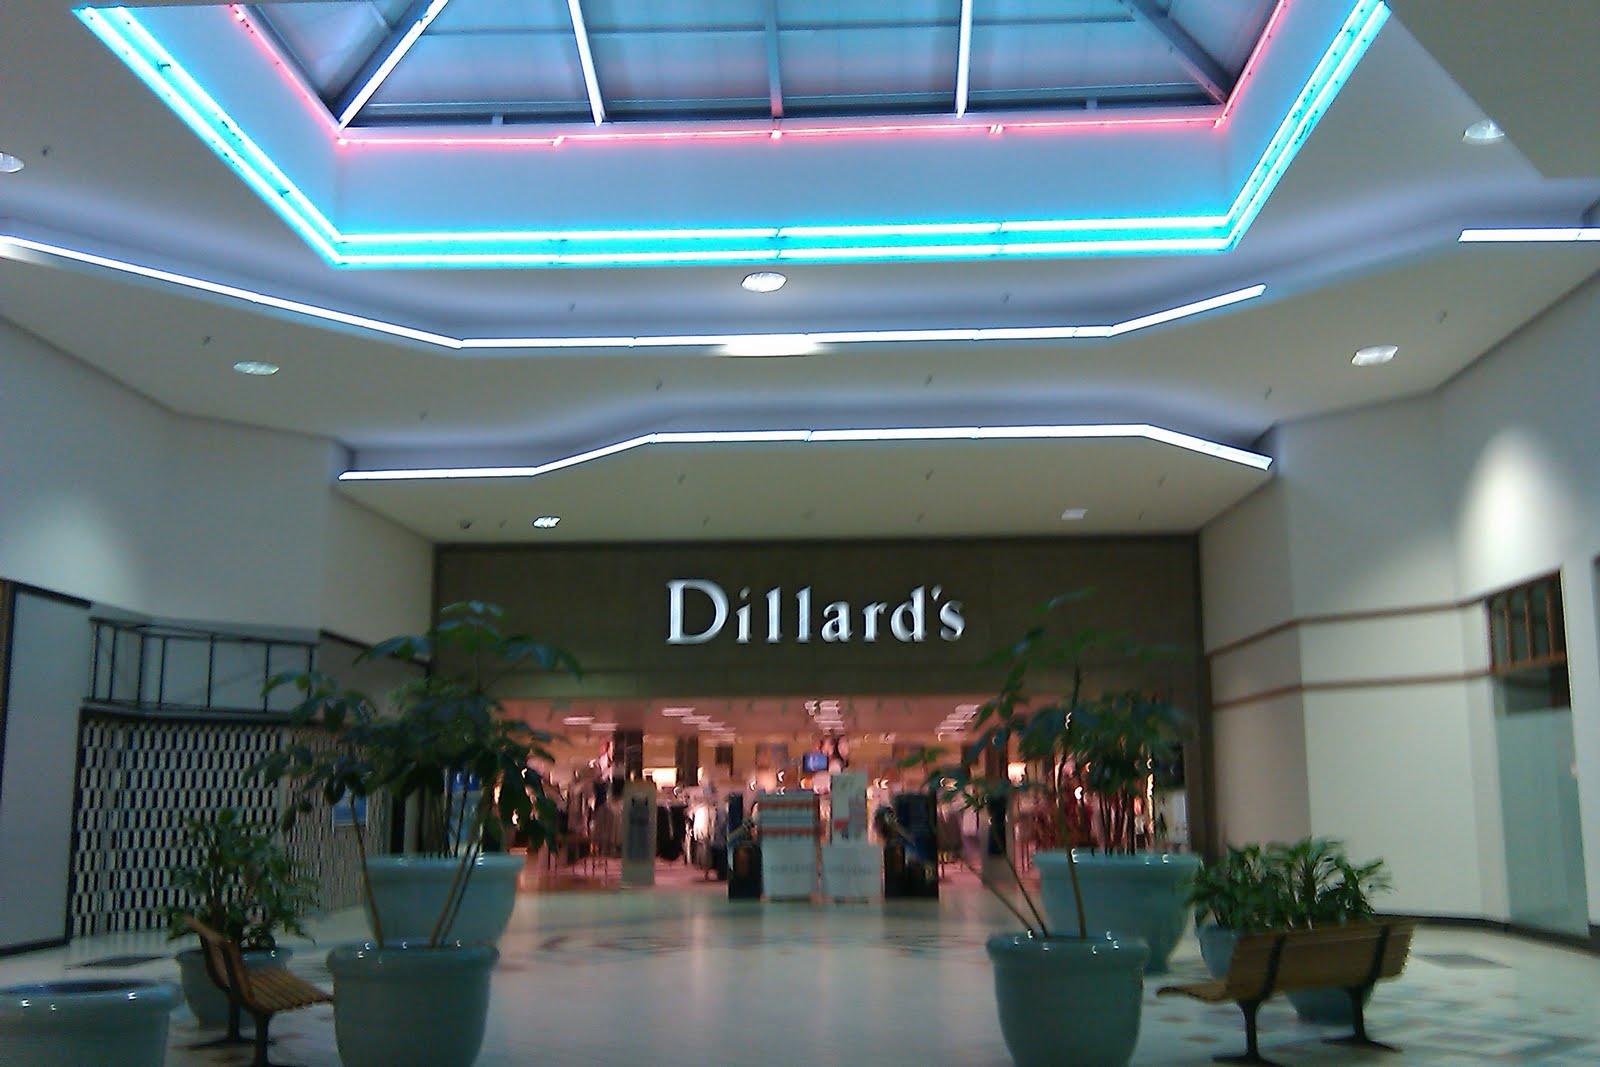 The Louisiana And Texas Retail Blogspot Neon Fading Away